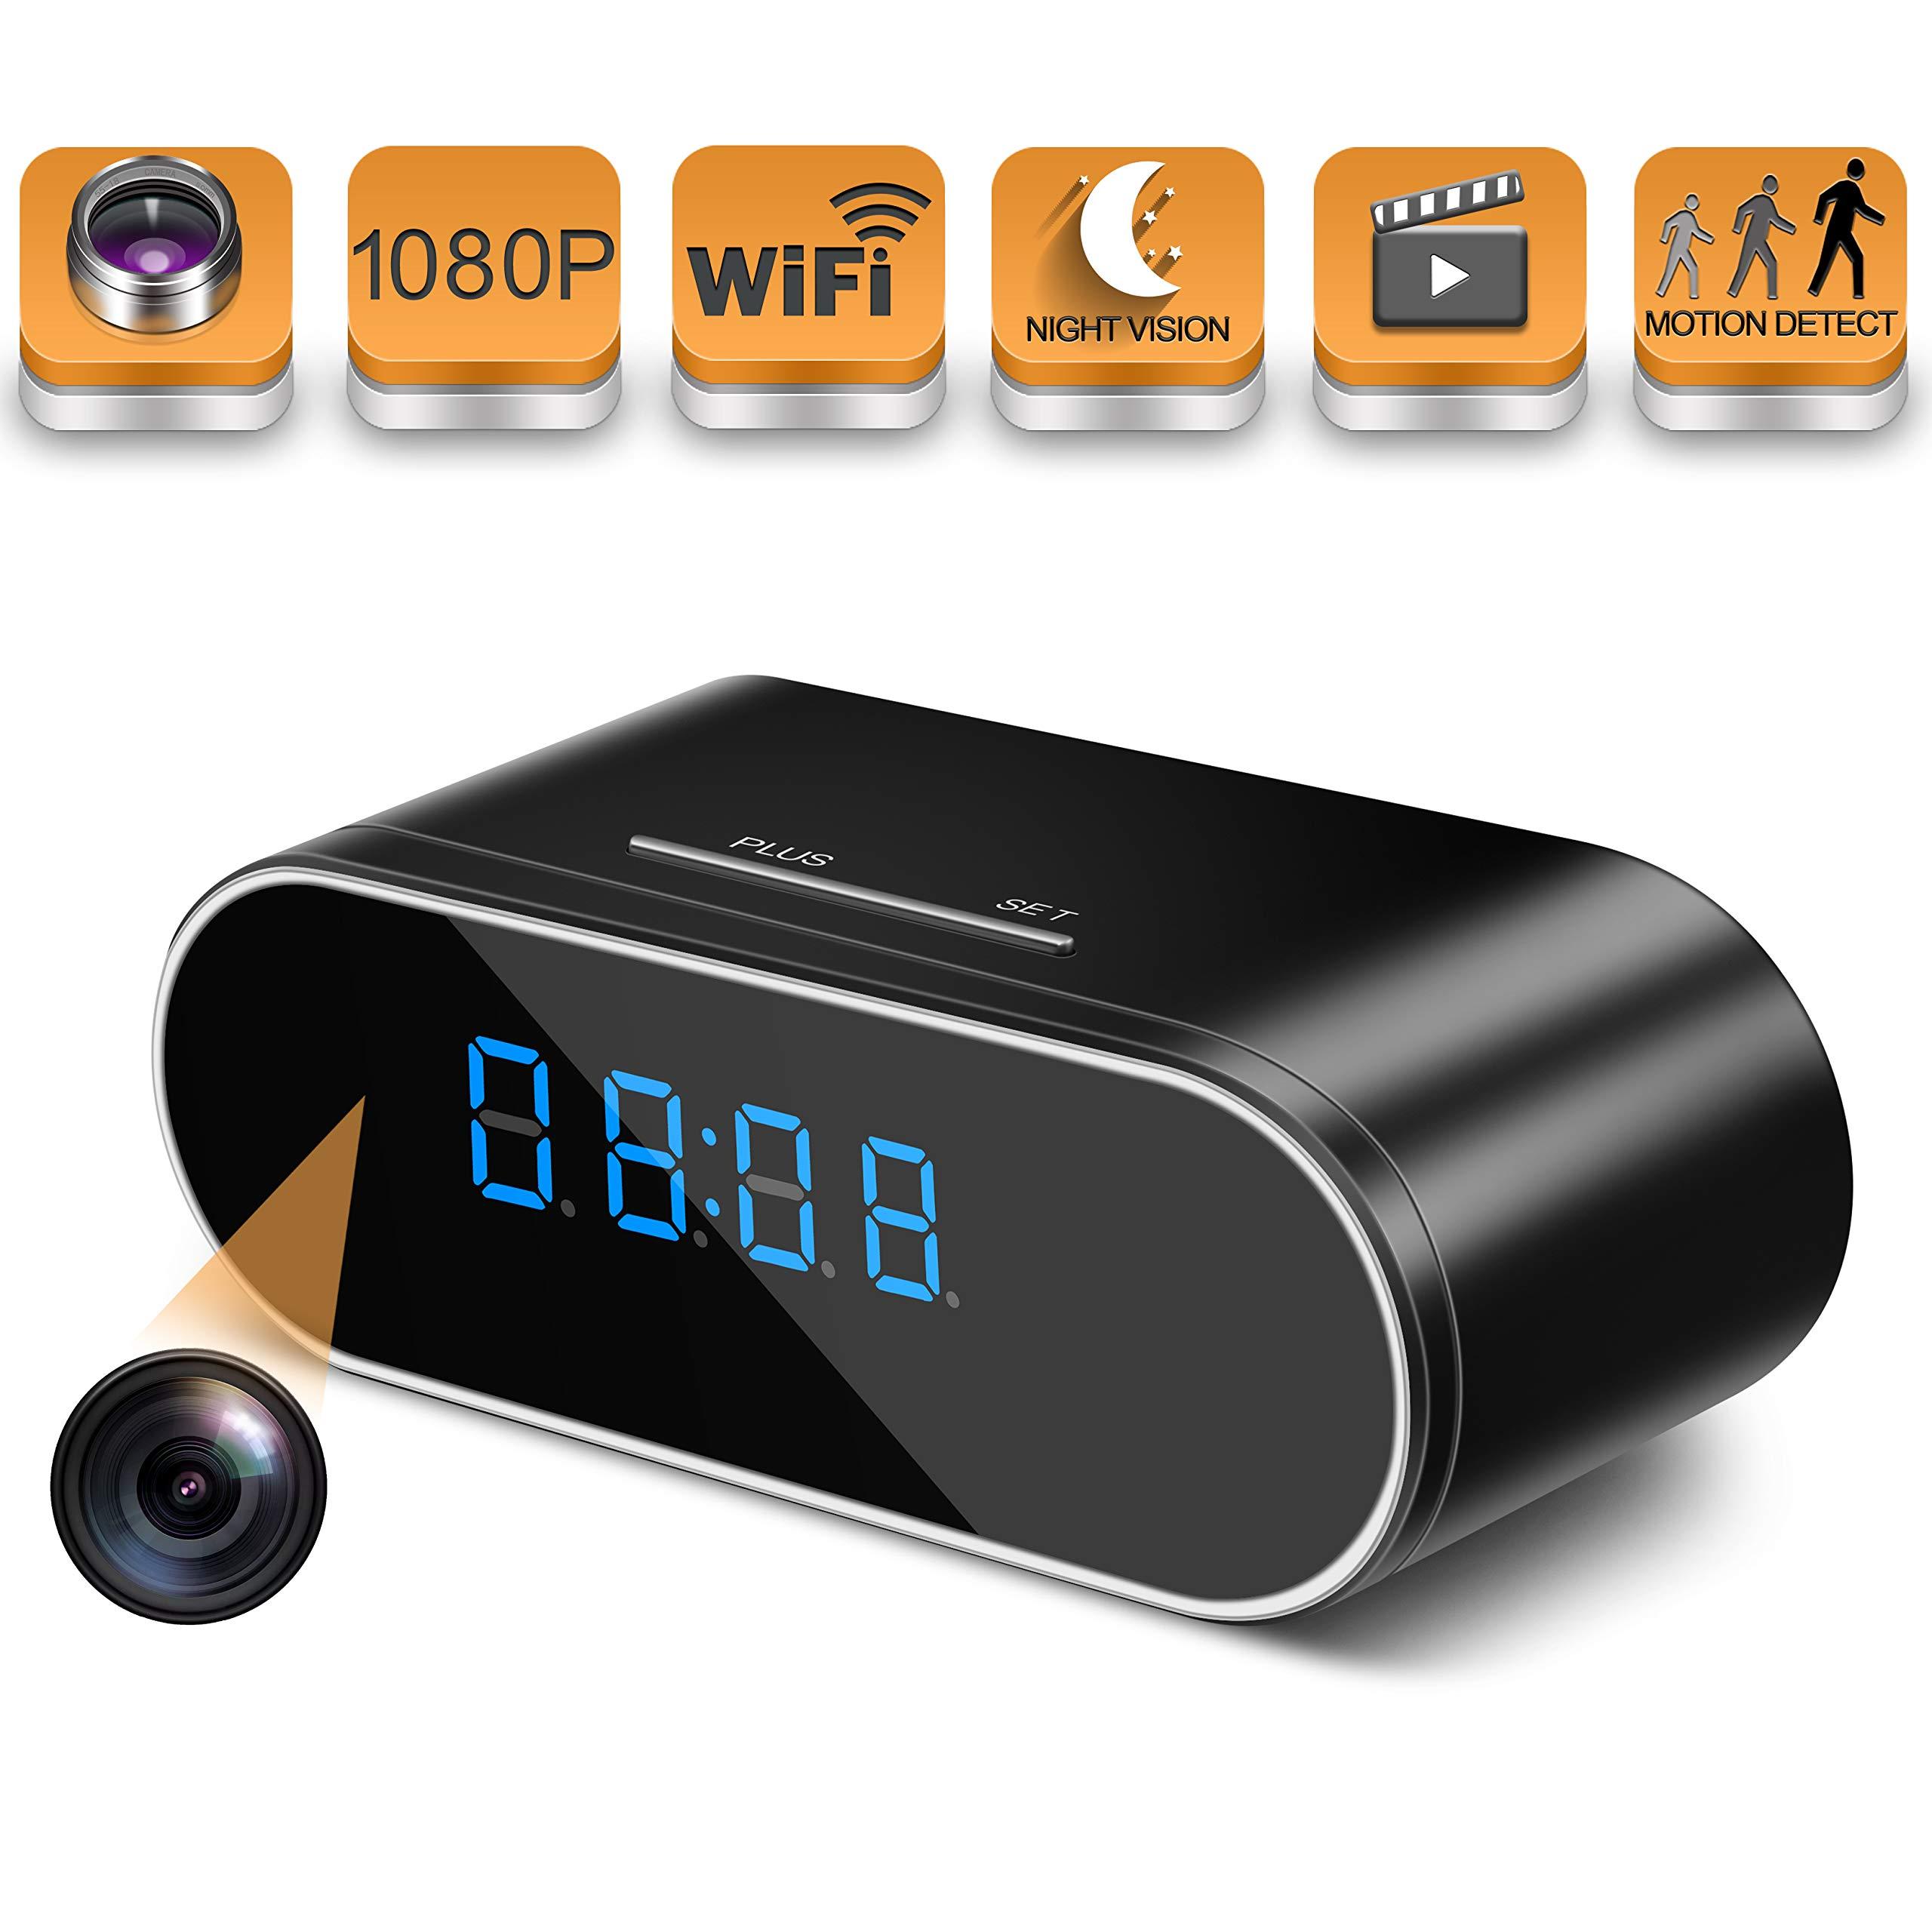 Hidden Camera WiFi Spy Camera,HOSUKU Clock 1080P Hidden Cameras Wireless IP Surveillance Camera for Home Security Monitor Video Recorder Nanny Cam 140°Angle Night Vision Motion Detection by HOSUKU (Image #1)